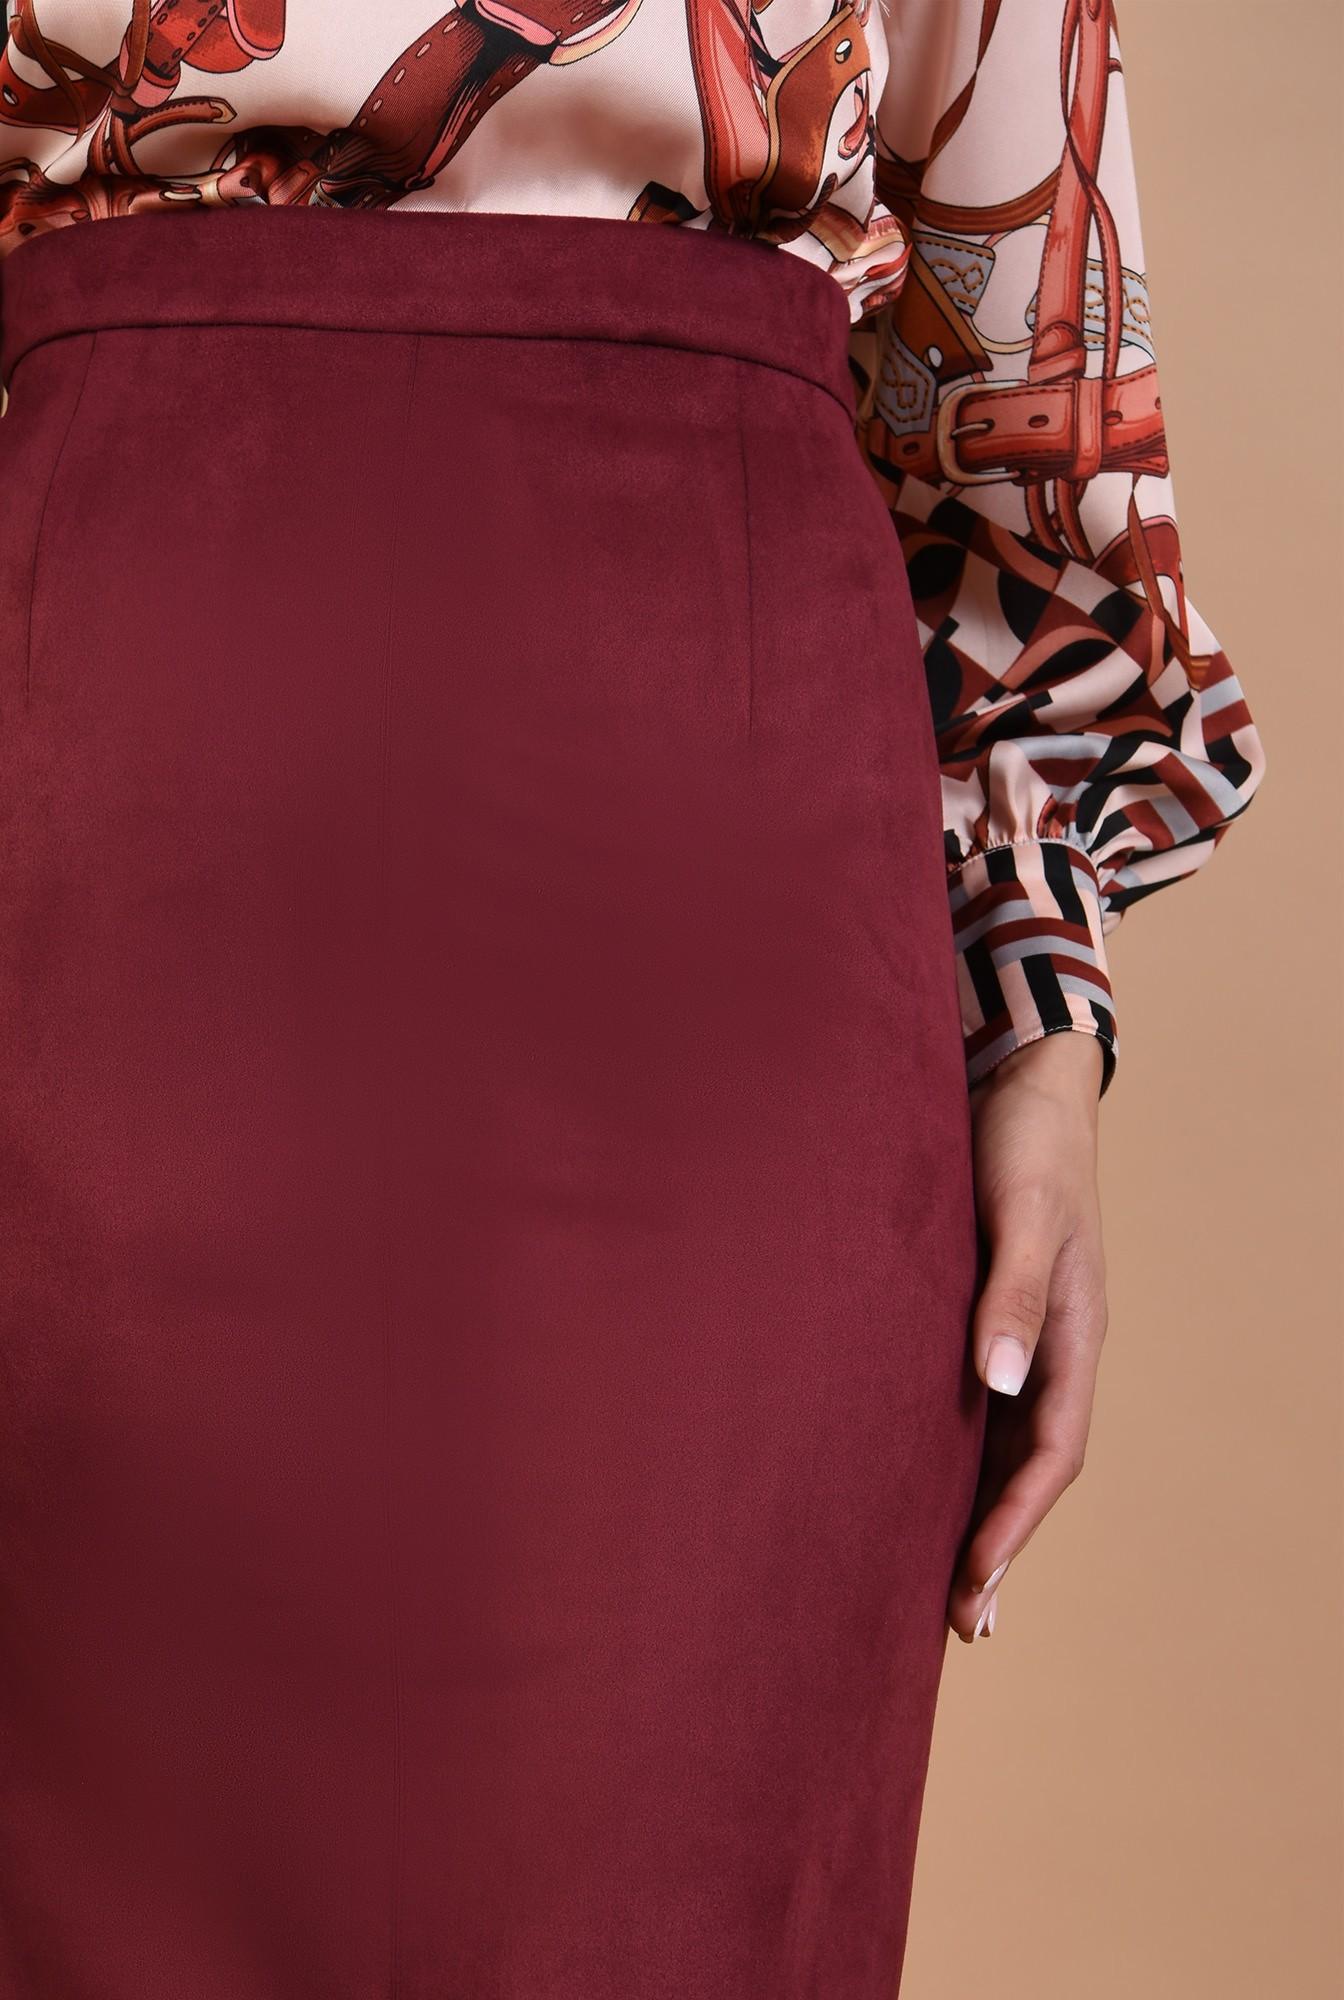 2 - fuste online, fusta de toamna, piele intoarsa, midi